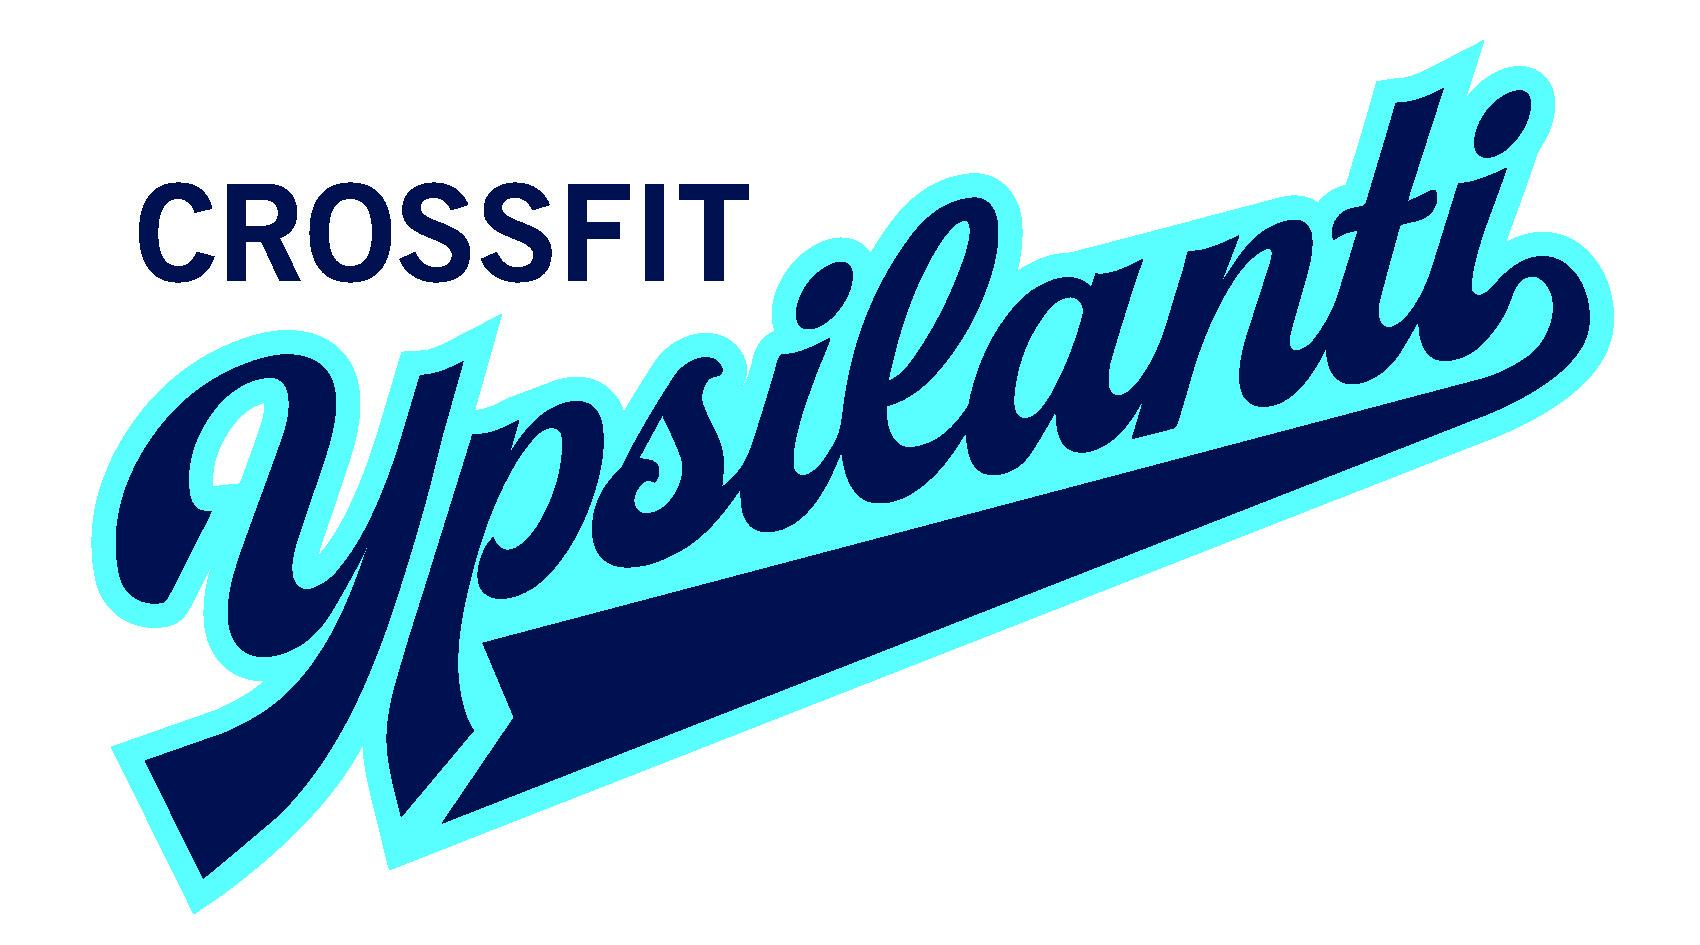 crossfit-ypsi-lg-logo.jpg